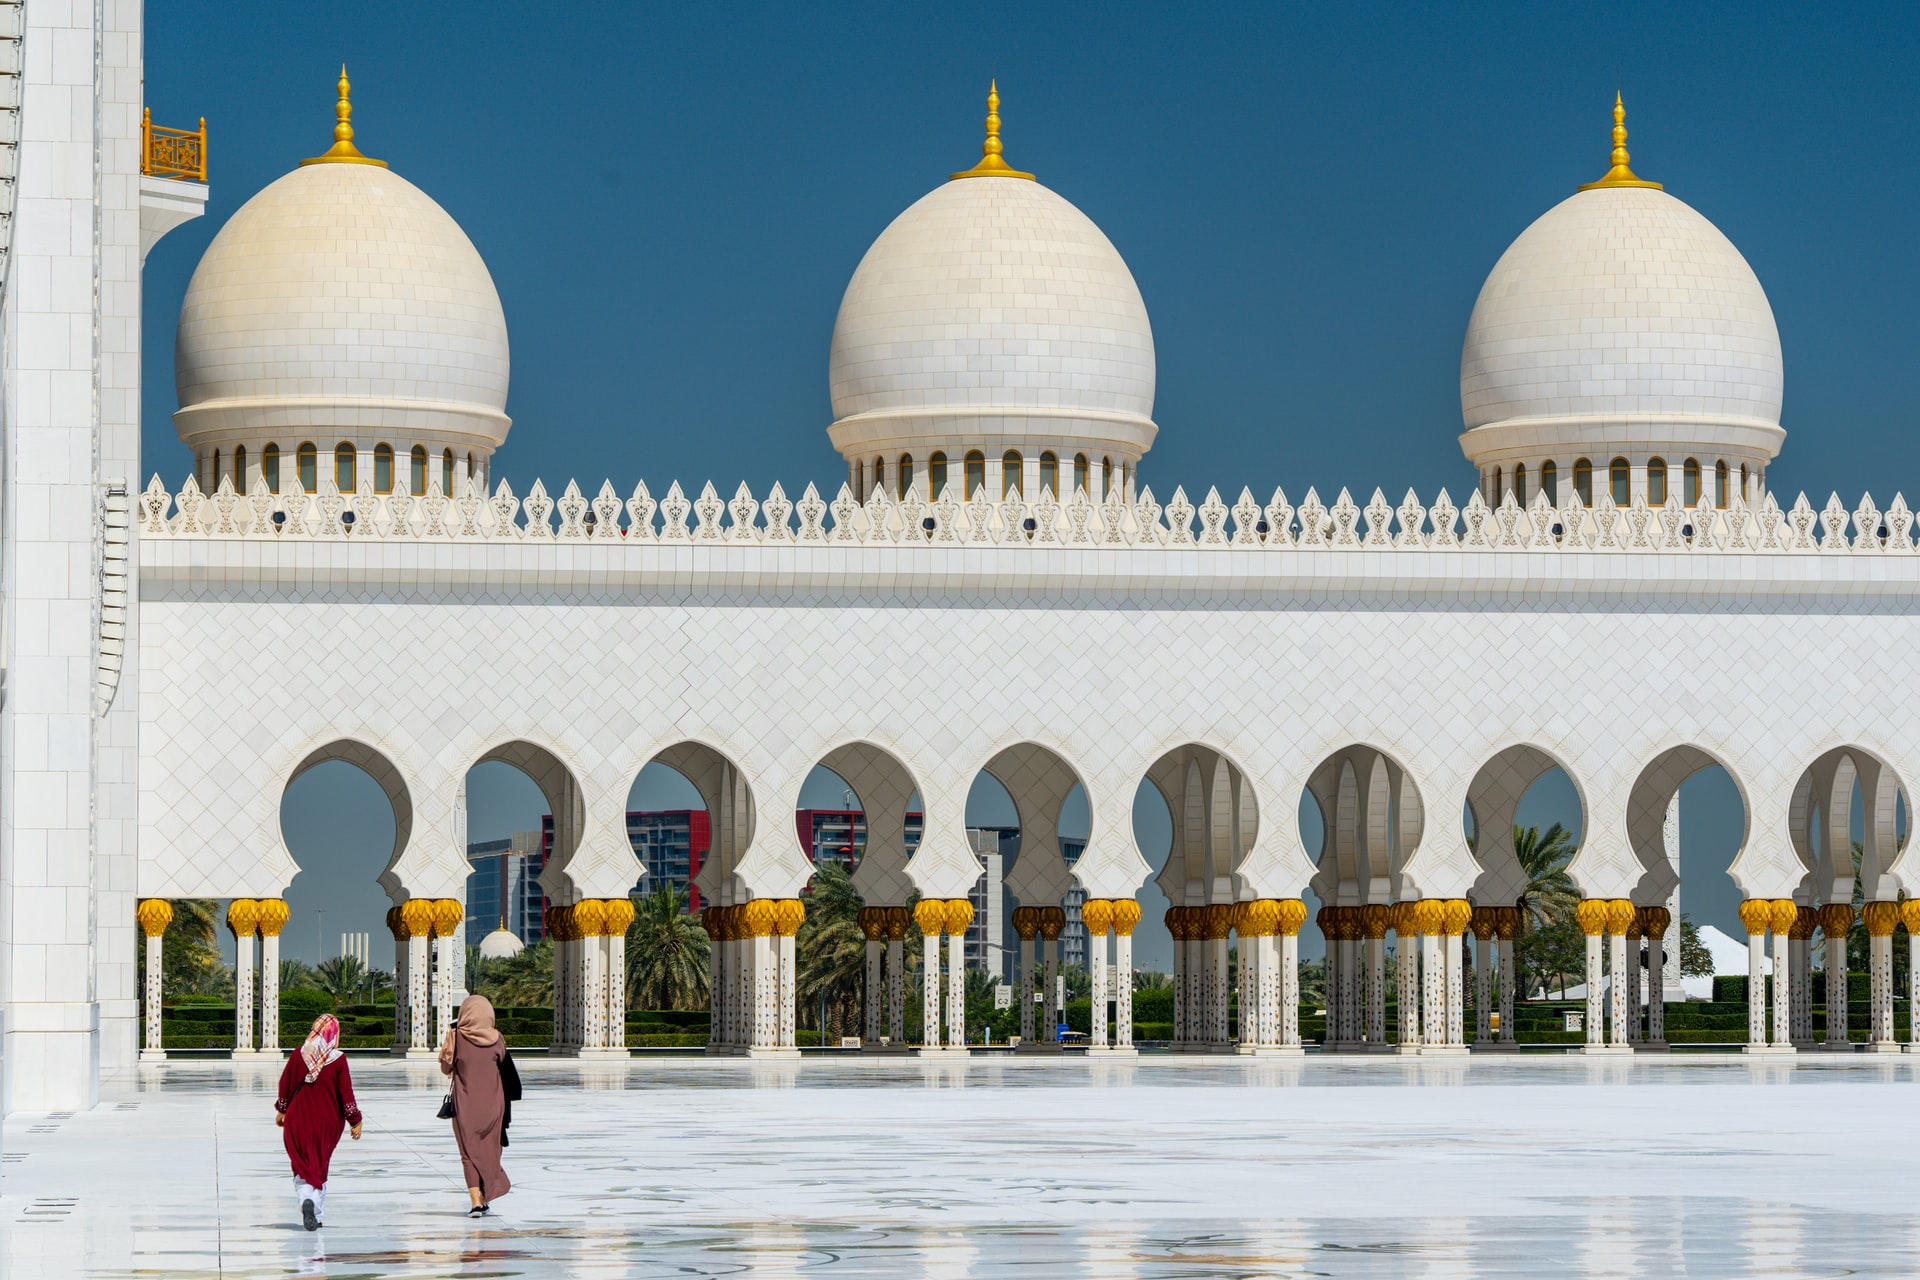 Sheik Zayed Grand Mosque (photo: Nick Fewings)